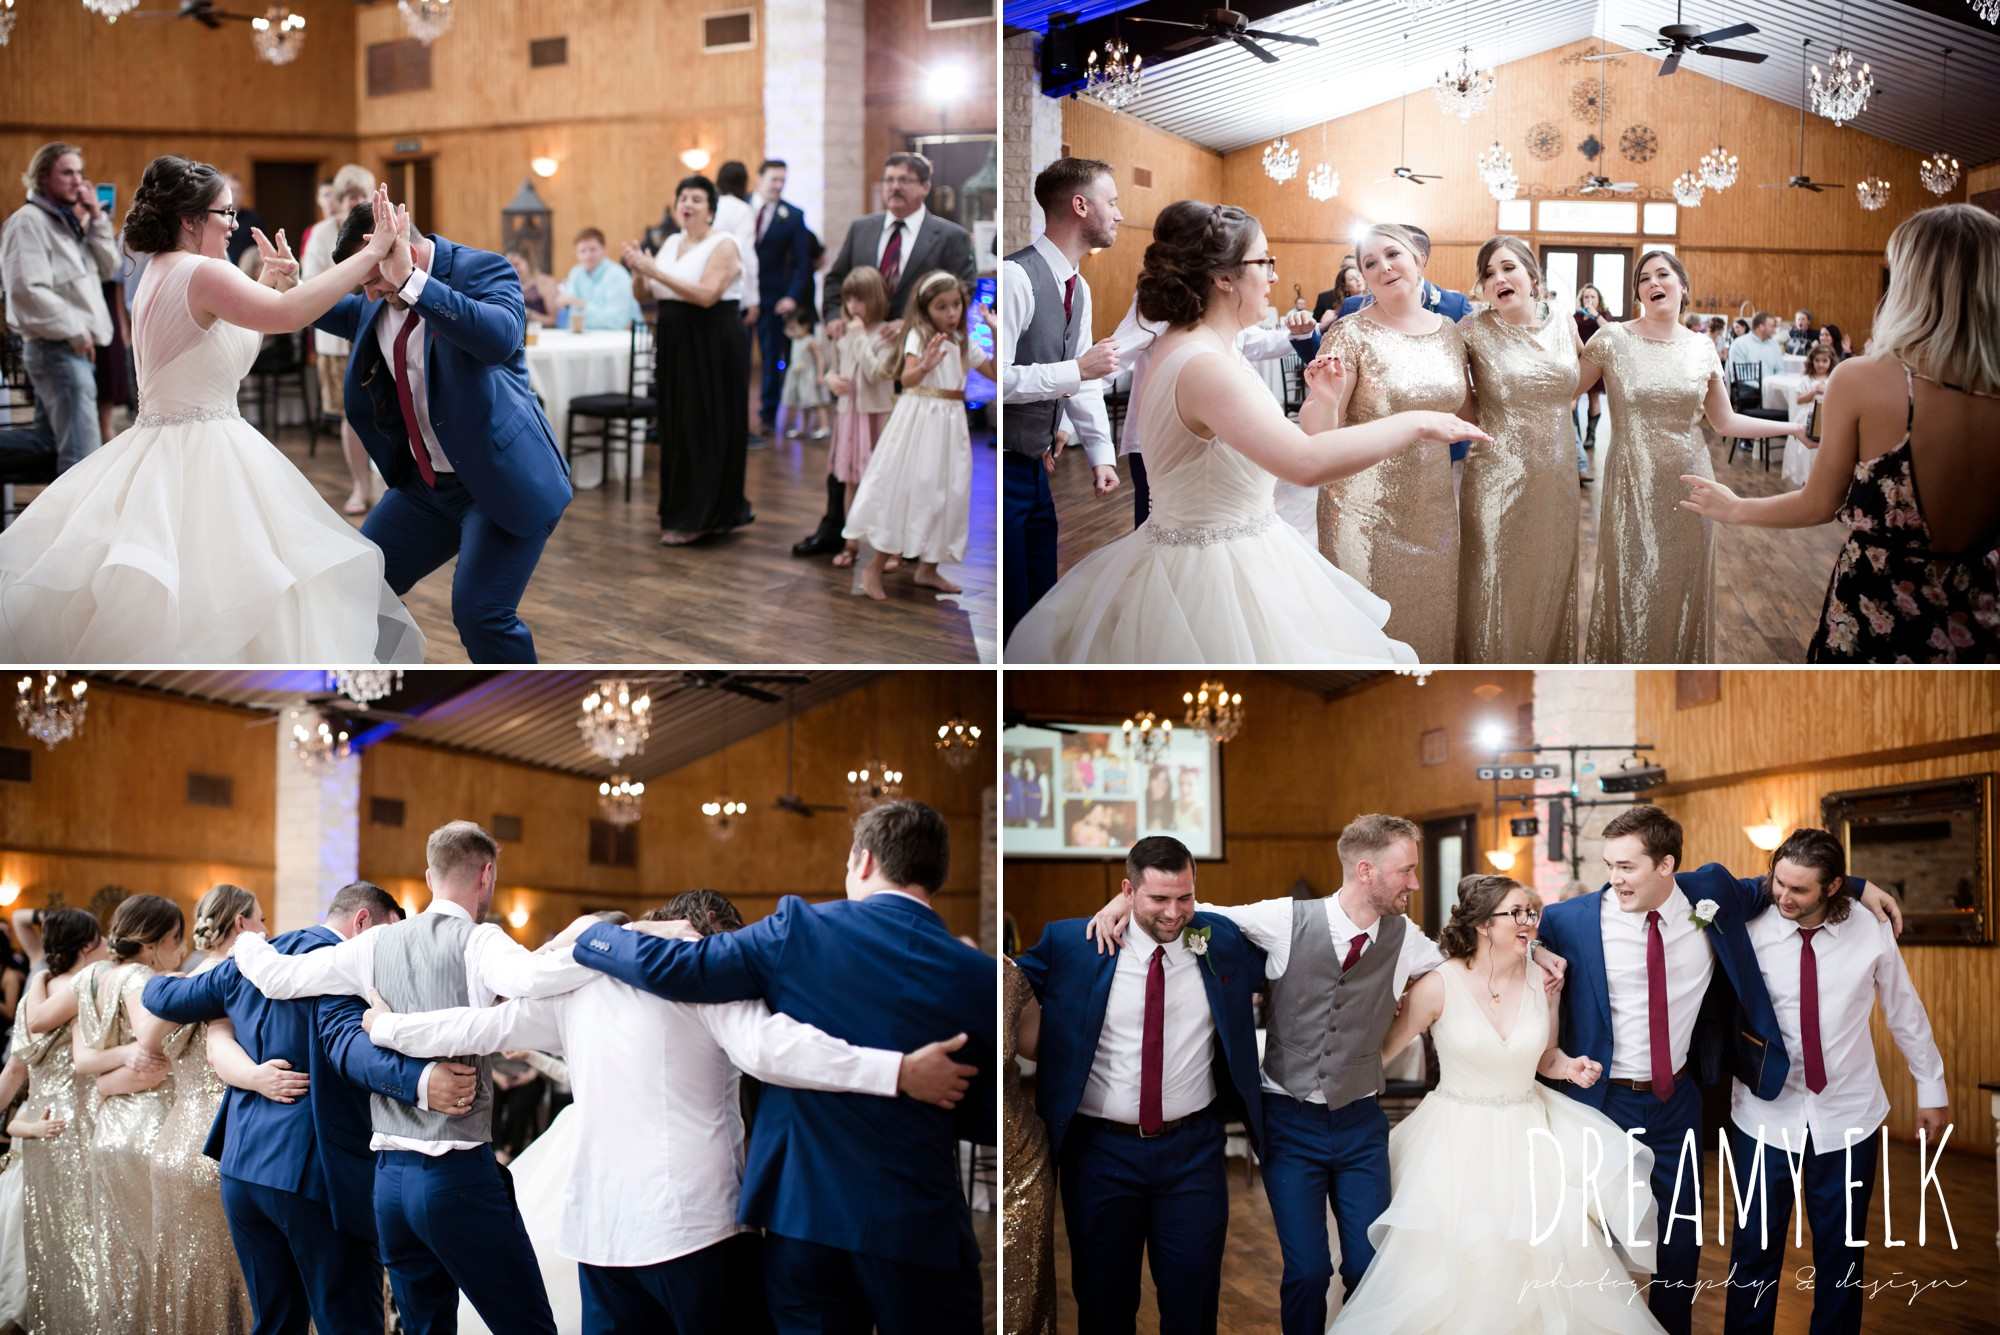 guests dancing at wedding, fall wedding, gold and navy wedding photo, ashelynn manor, austin texas wedding photographer, dreamy elk photography and design, emily ross